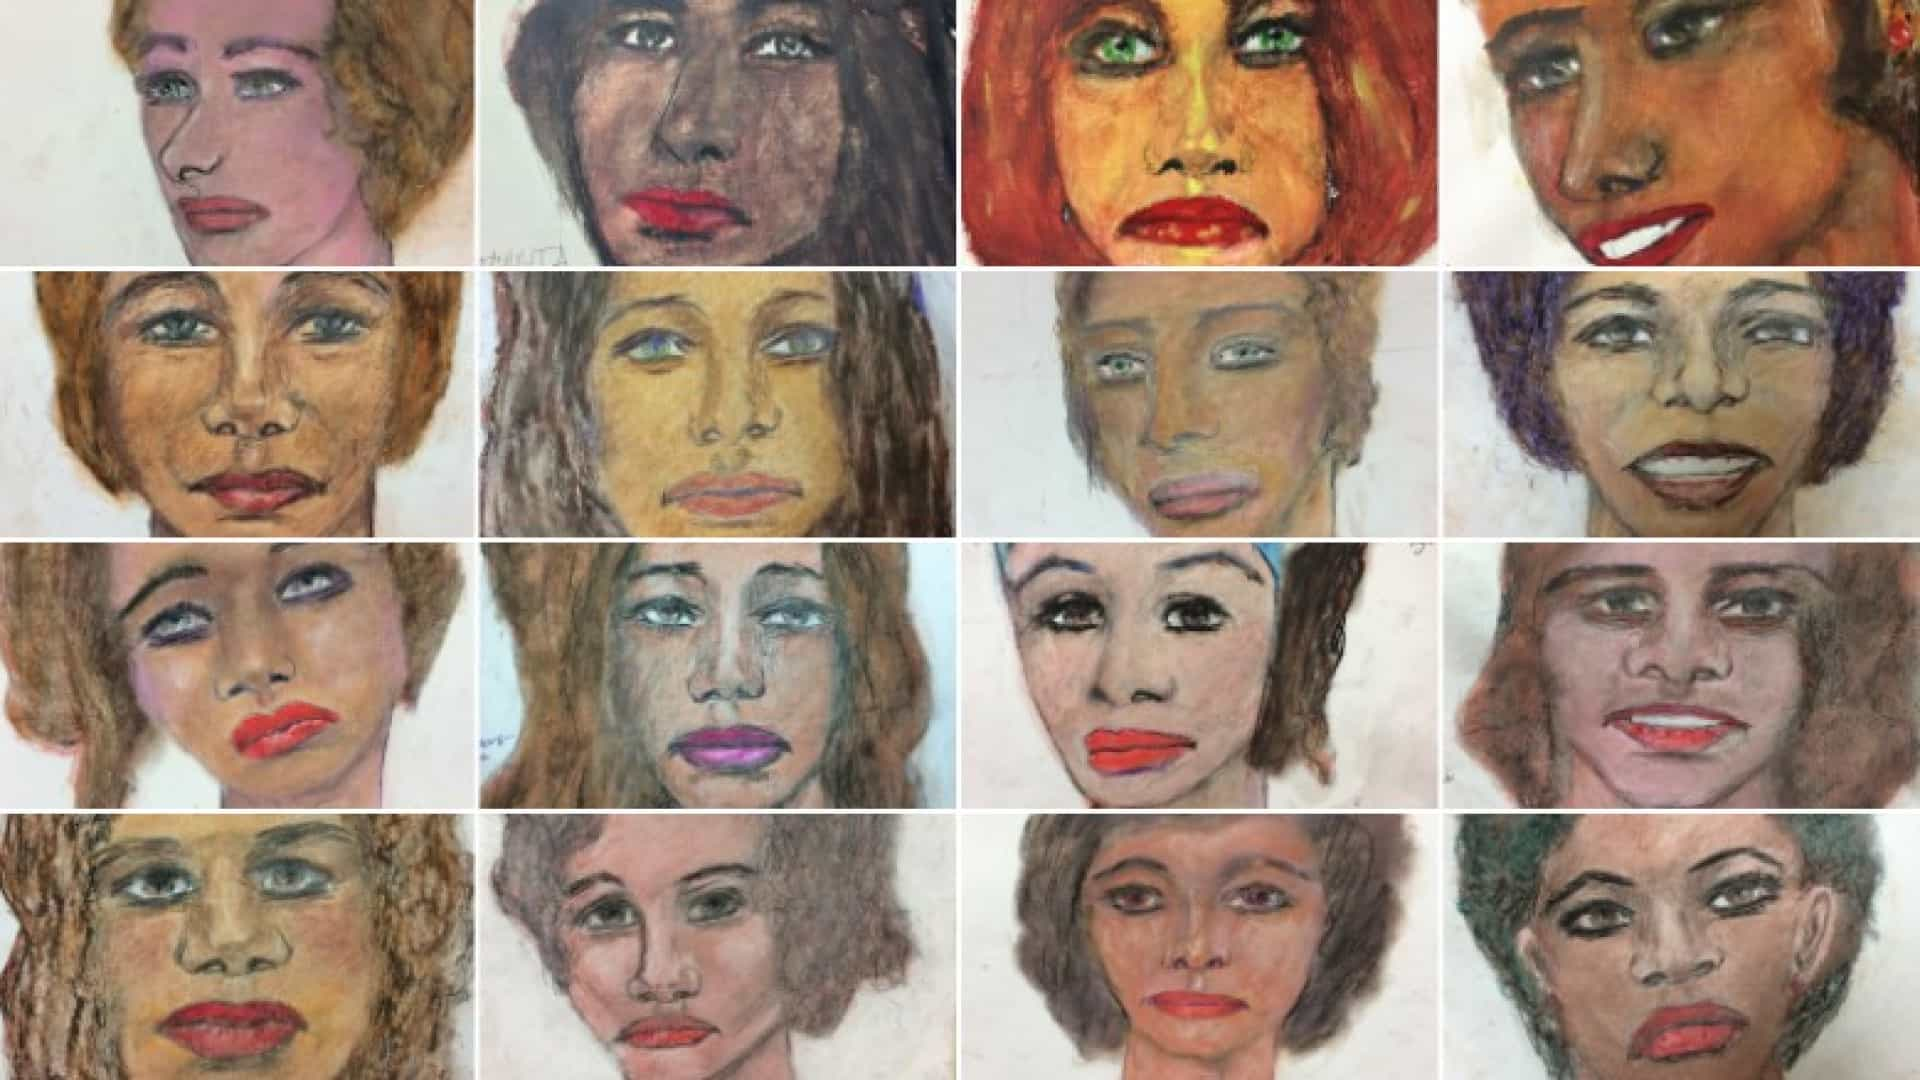 Serial killer desenhou vítimas. FBI usa imagens para identificá-las